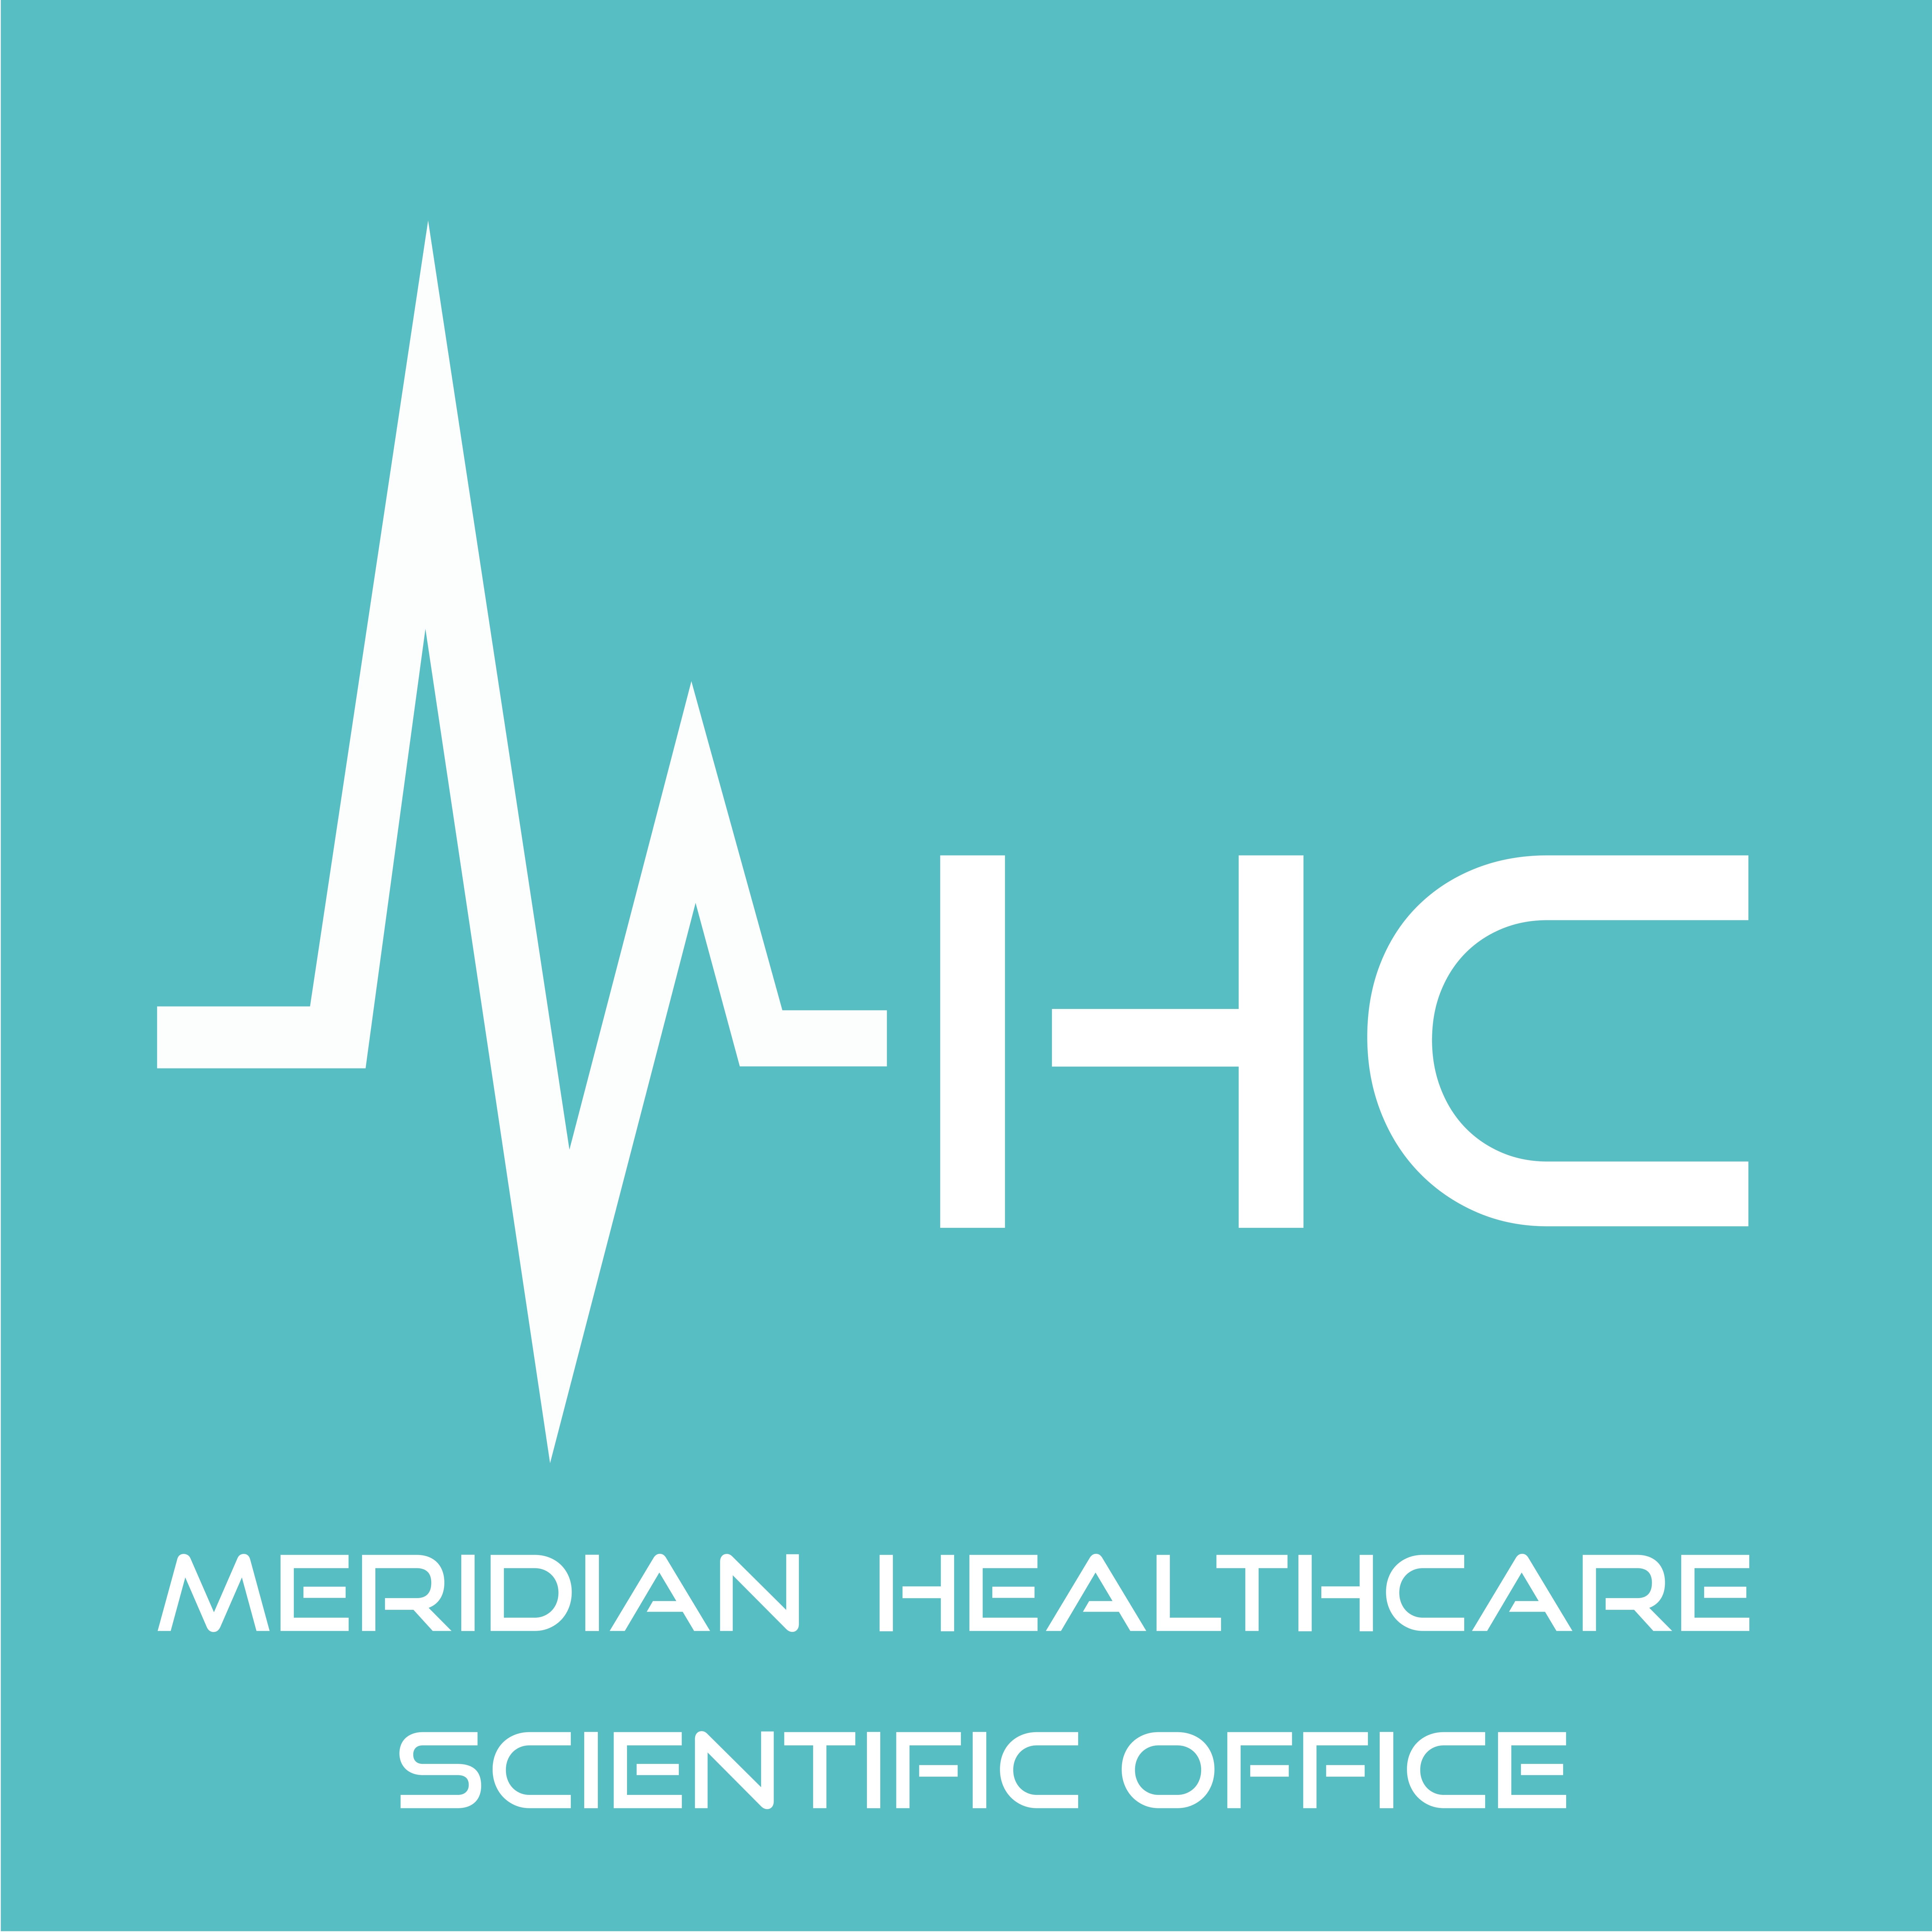 Meridian Healthcare Scientific Office